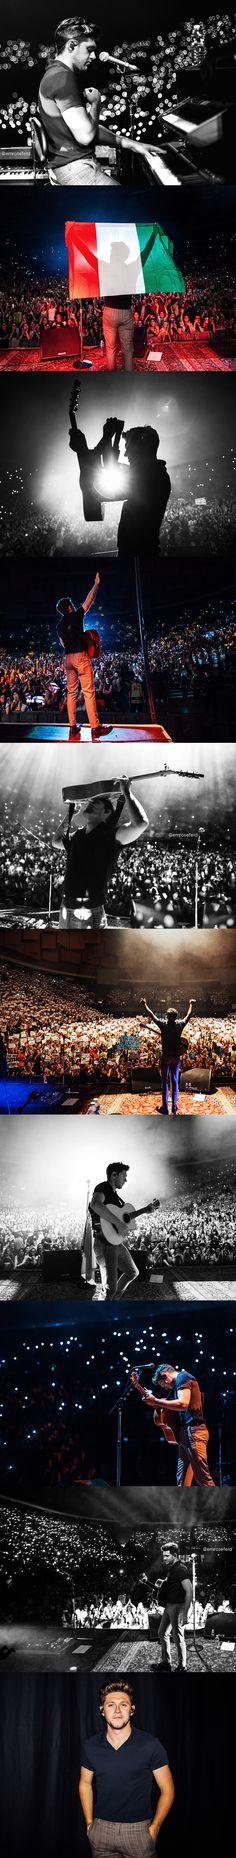 Niall Horan | 5.6.18 Bologna, Italy | emrosefeld |